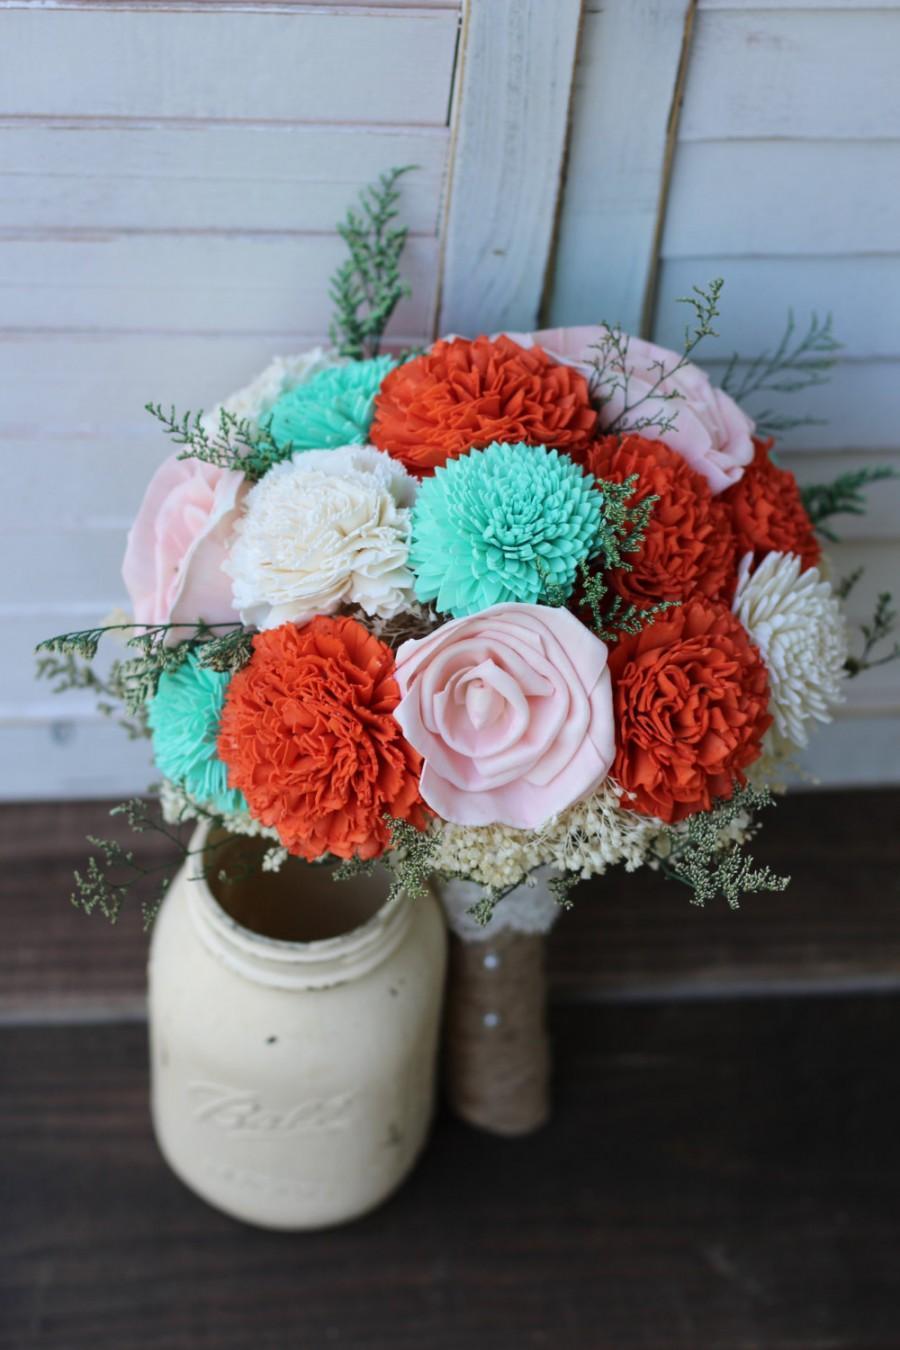 Свадьба - Orange Teal Bouquet, Sola Bouquet, Wedding Bouquet, Rustic Wedding, Bridal Bouquet, Bouquet, Country Wedding, wedding flowers